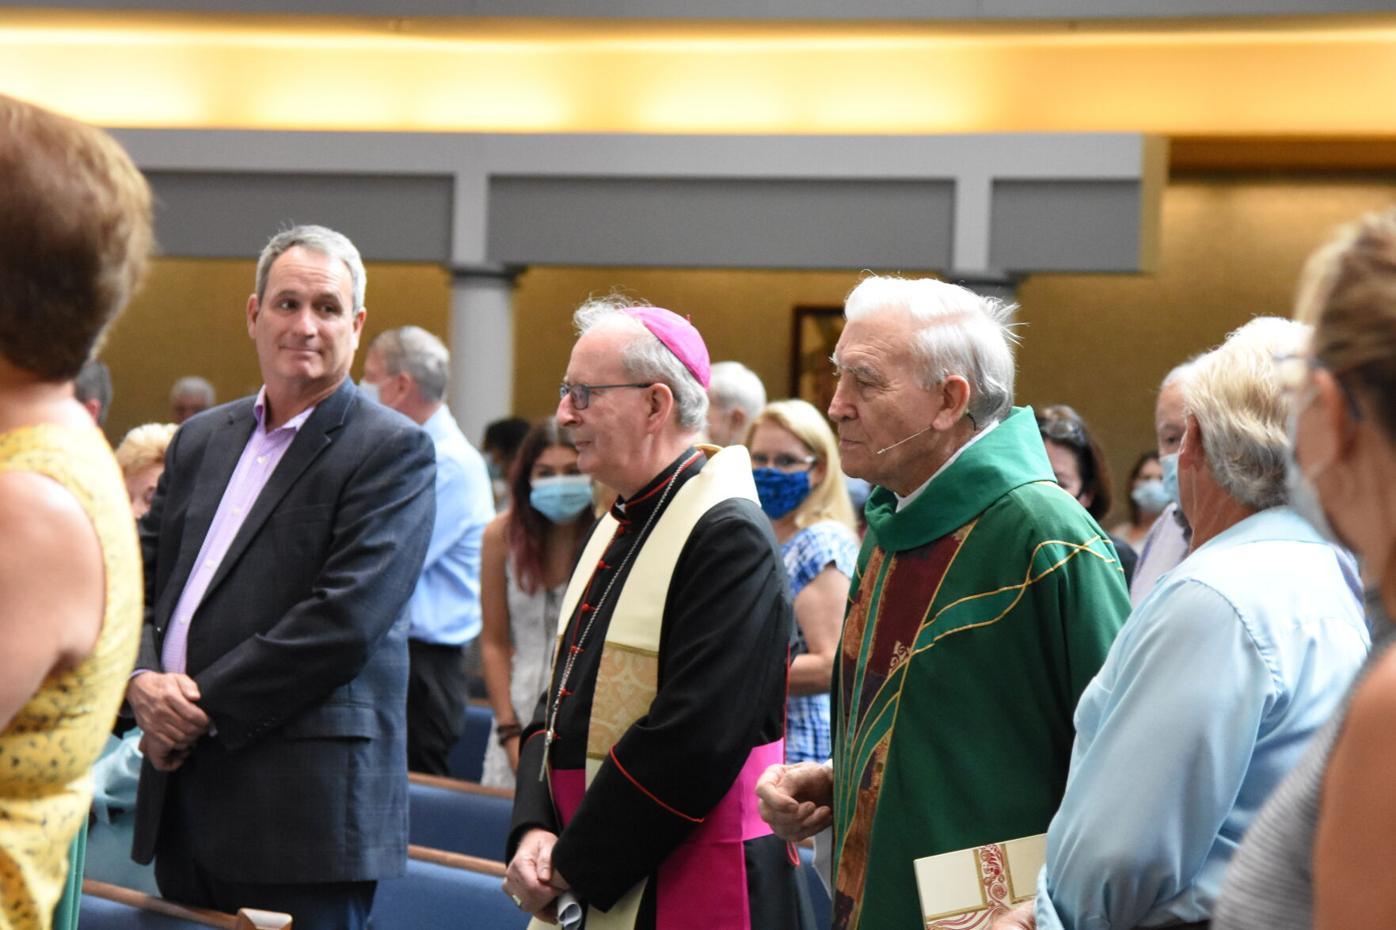 Bishop John Noonan (left) and Monsignor John Bluett at monsignor's farewell Mass, June 13. Both priests are from Limerick, Ireland. (GLENDA MEEKINS)